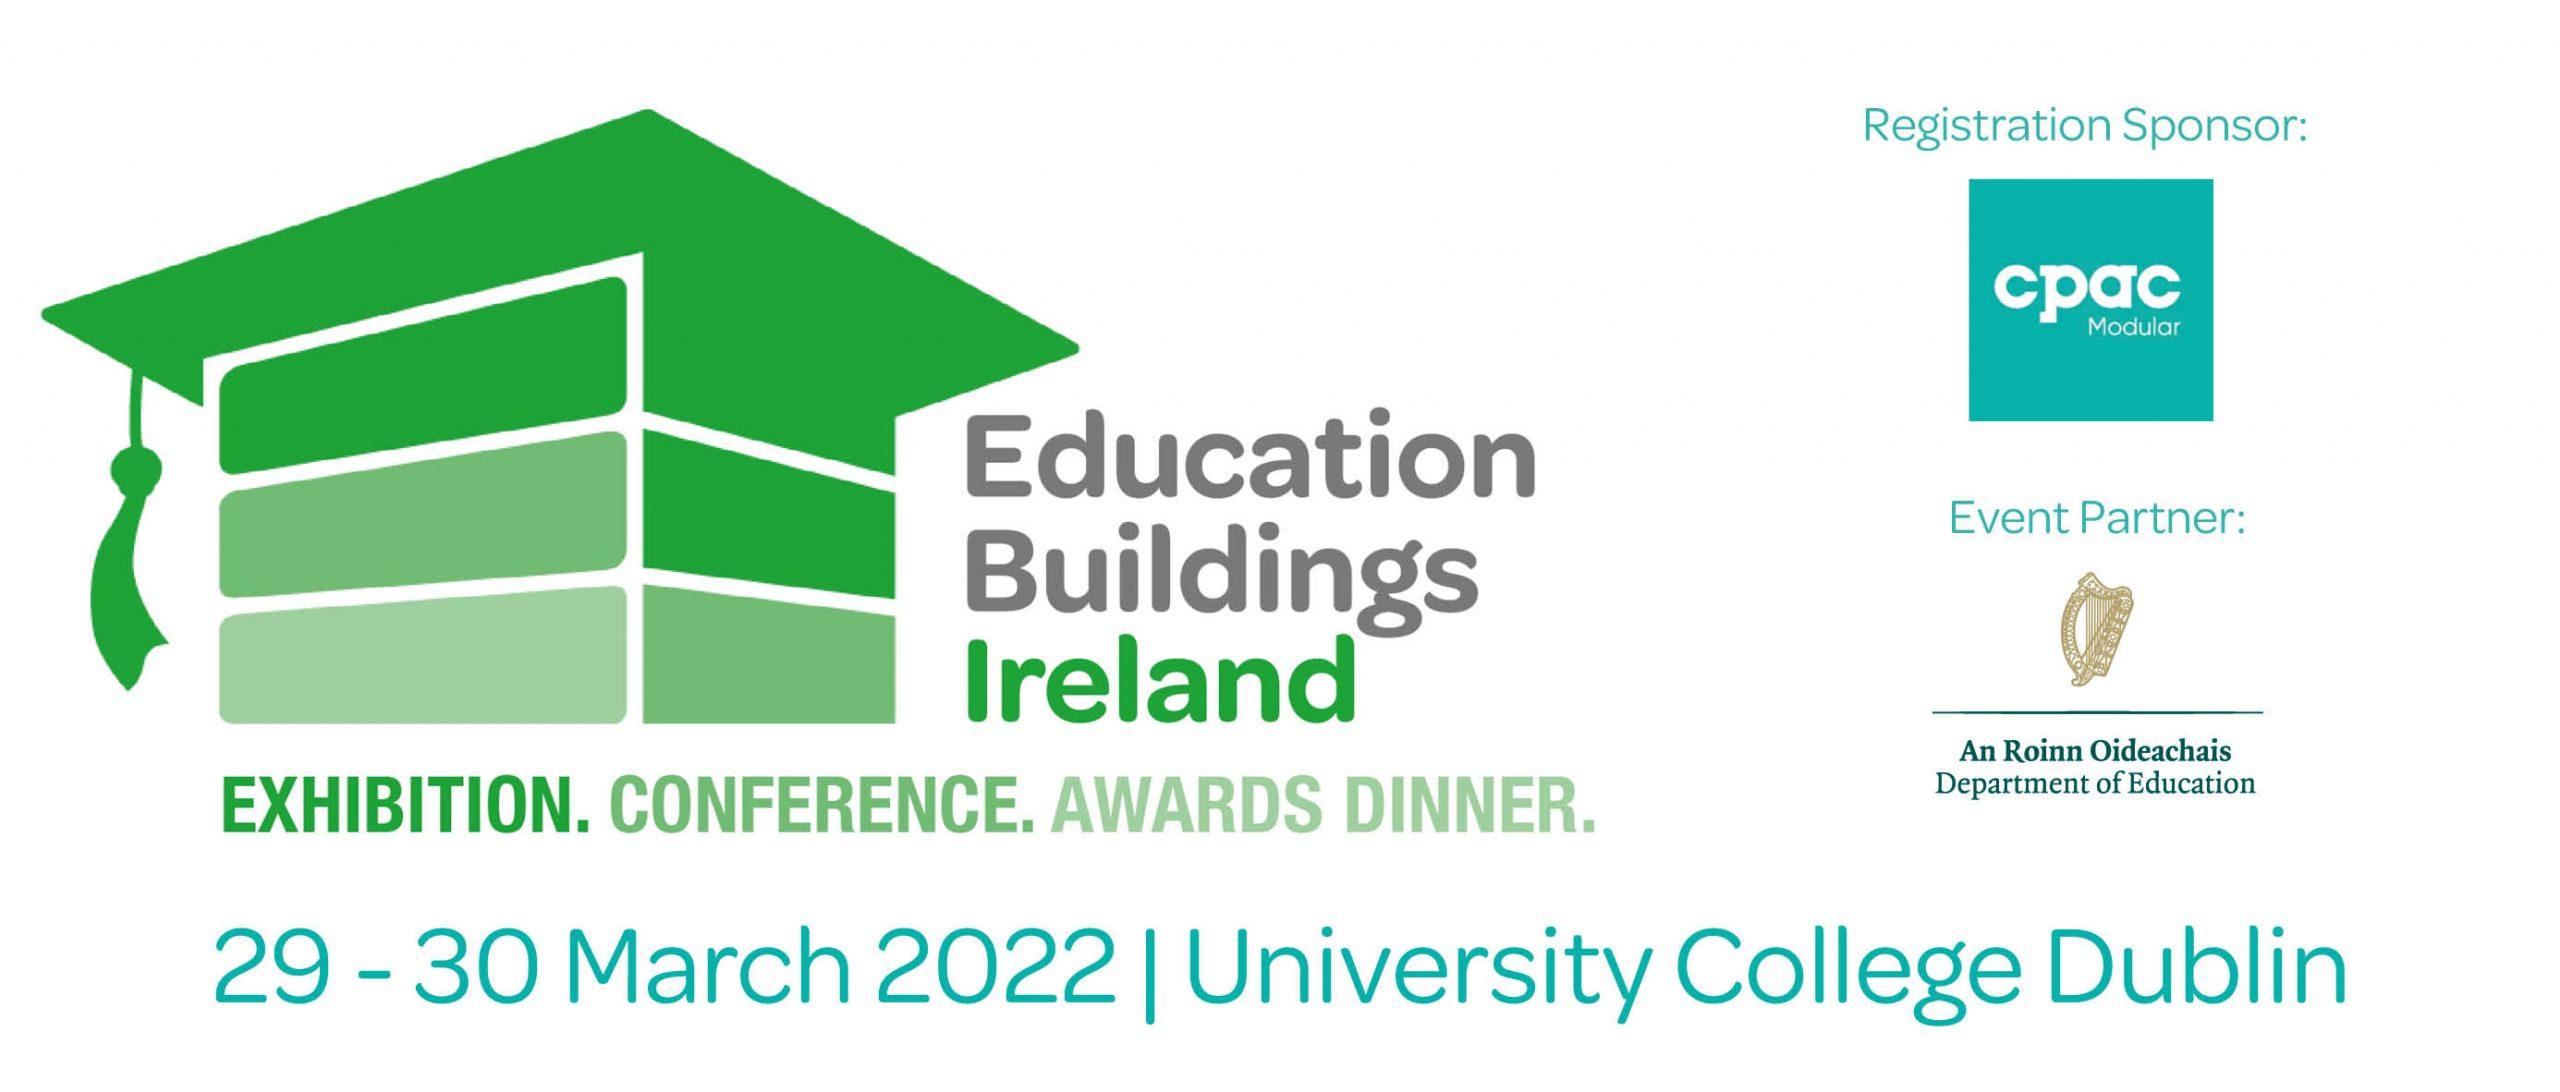 Education Buildings Ireland